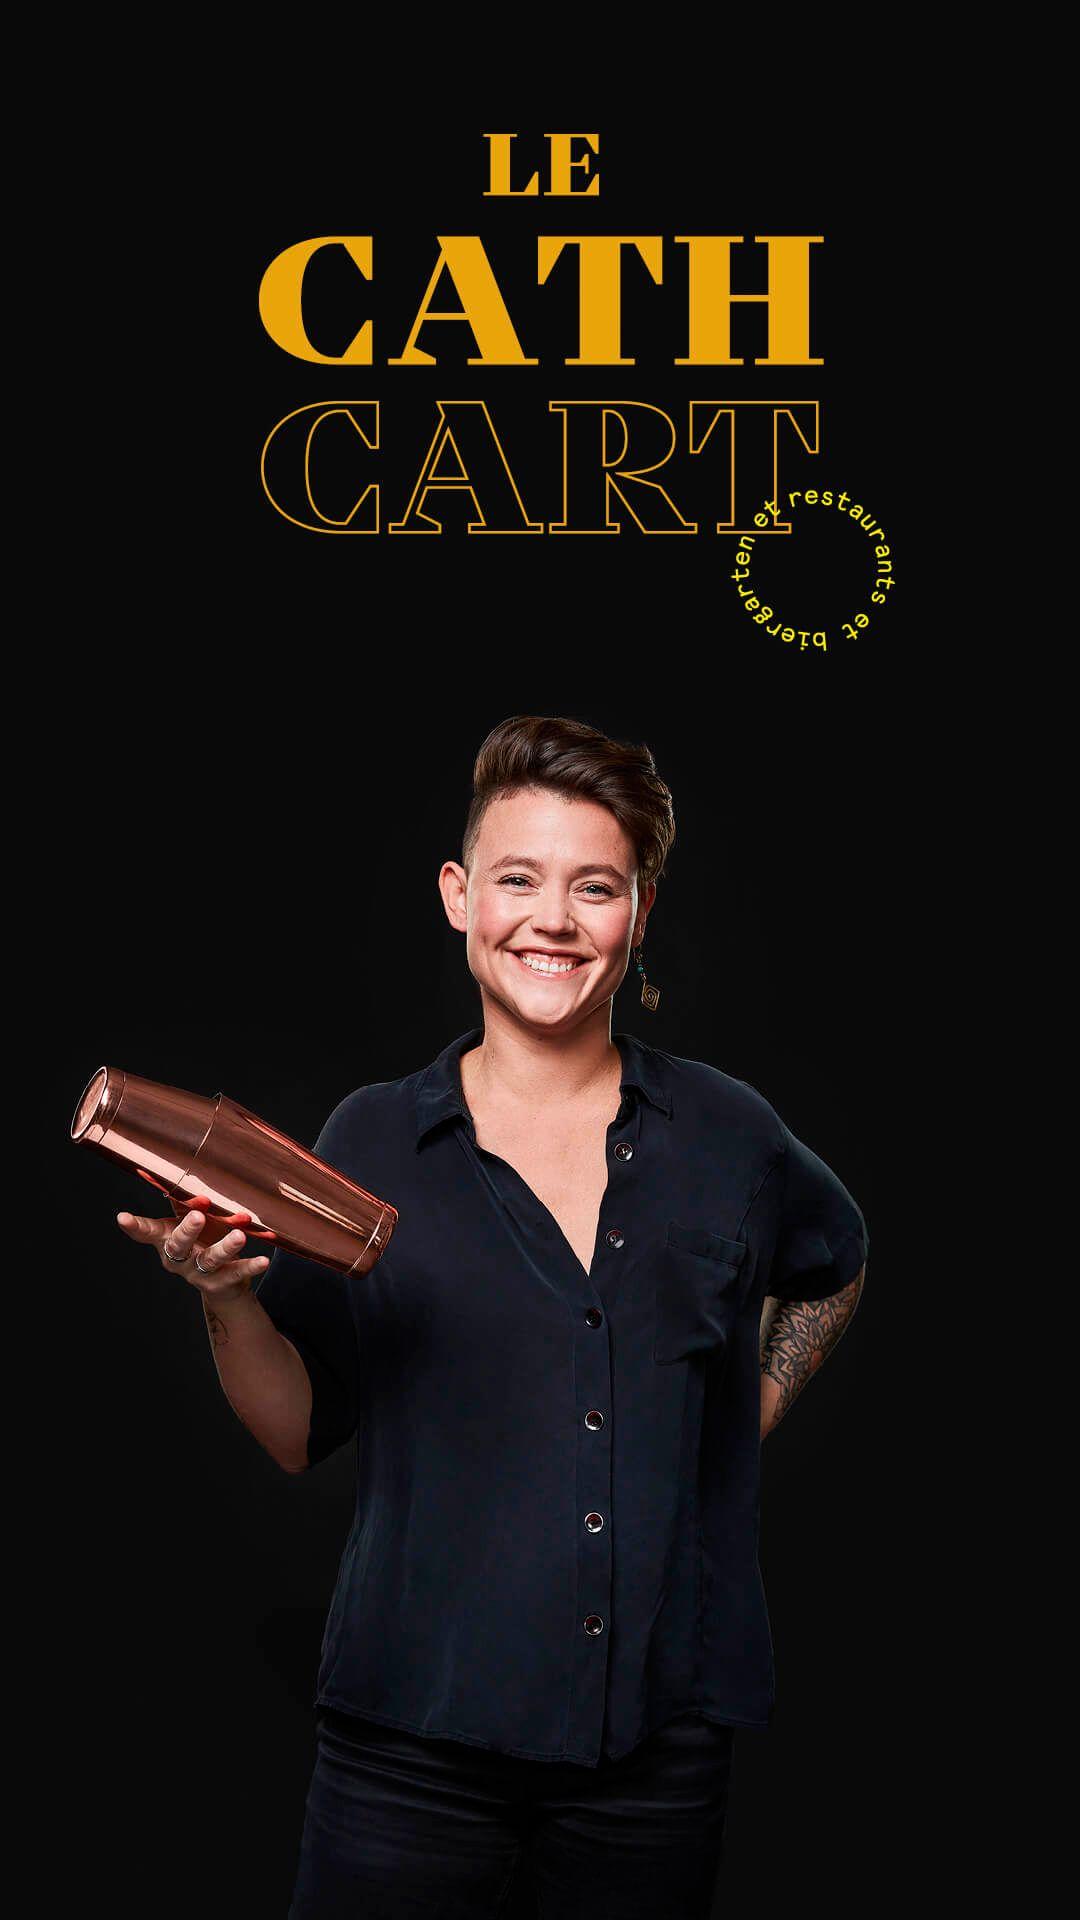 Daphnee Vary Deshaies by Jocelyn Michel for Cathcart restaurant